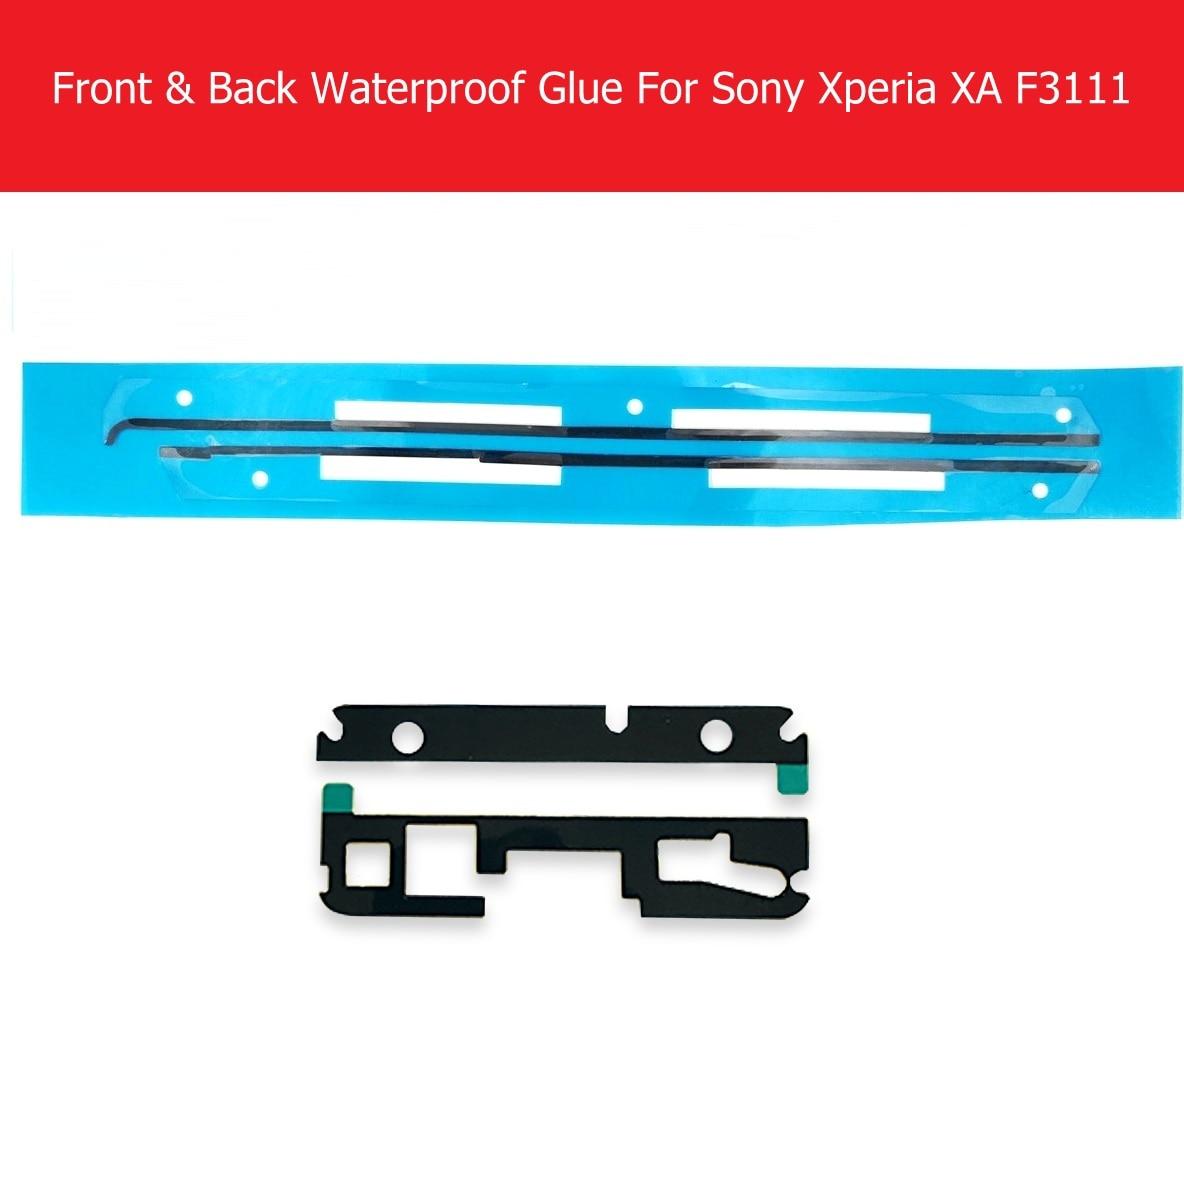 Marco de panel de pantalla LCD y cubierta trasera, pegatina impermeable para Sony Xperia XA F3111 F3113 F3115, pegamento adhesivo impermeable de reemplazo